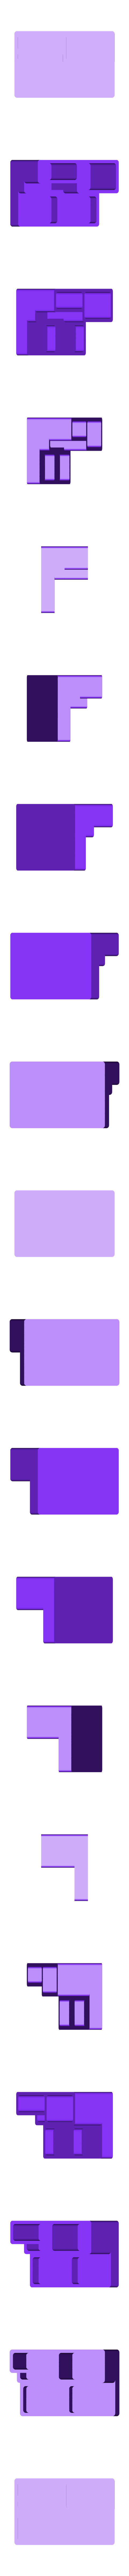 solo.STL Download free STL file desktop organizer / pen holder • 3D print object, allv